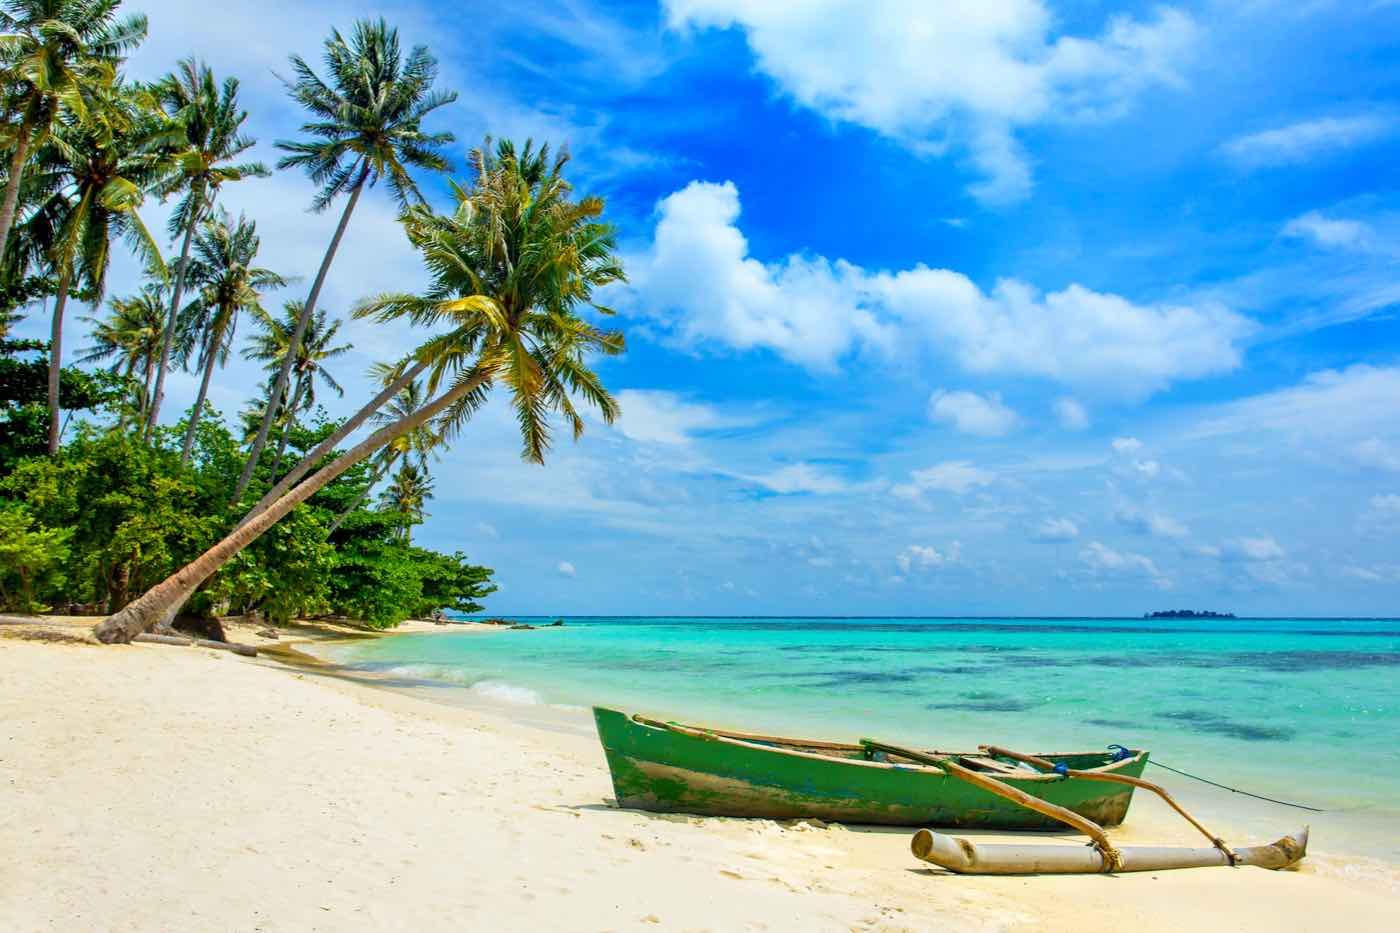 Hermosa playa tropical en la isla de Karimunjawa, Indonesia